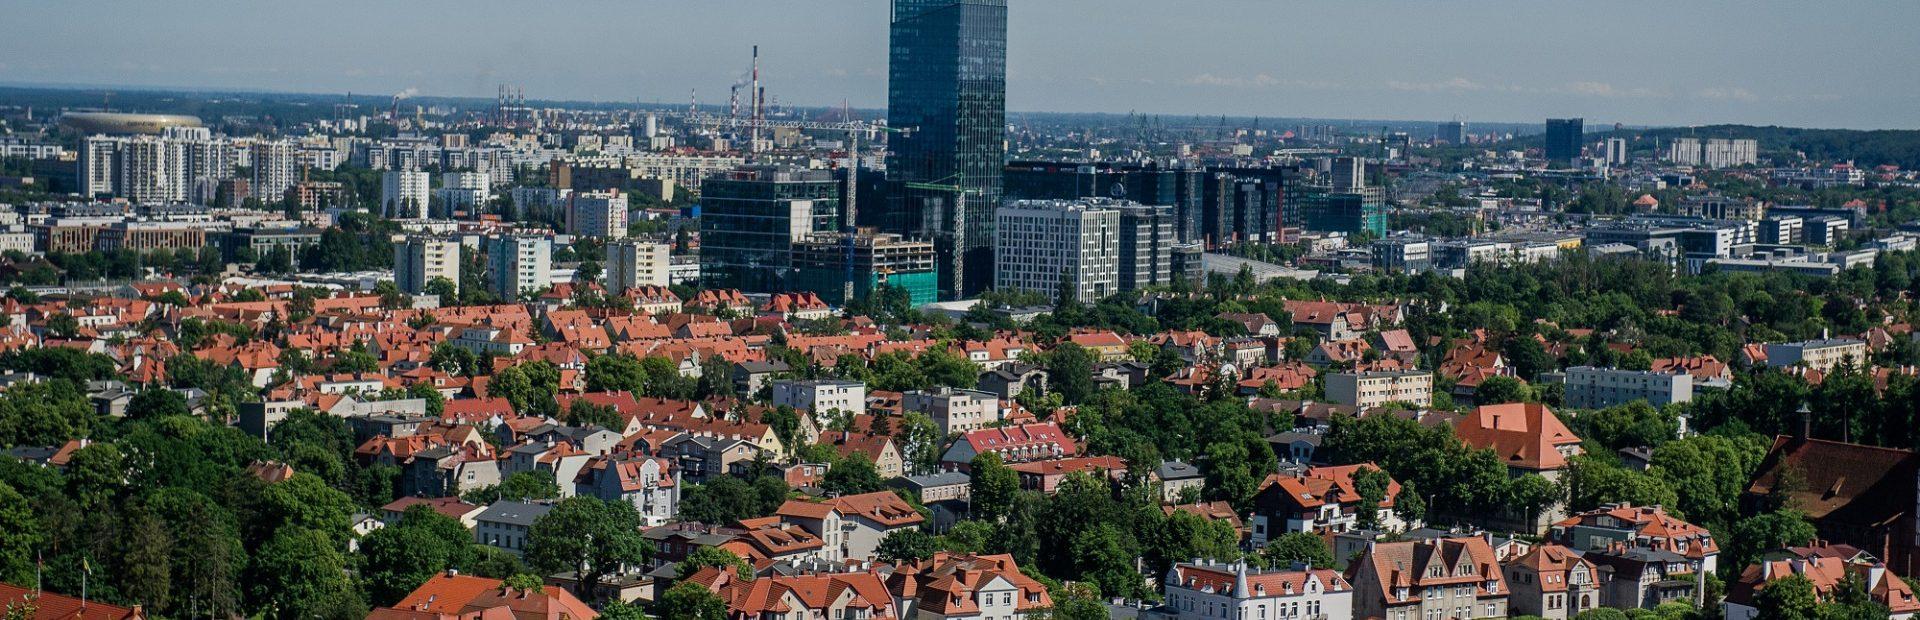 Oliwa – a District of Gdansk